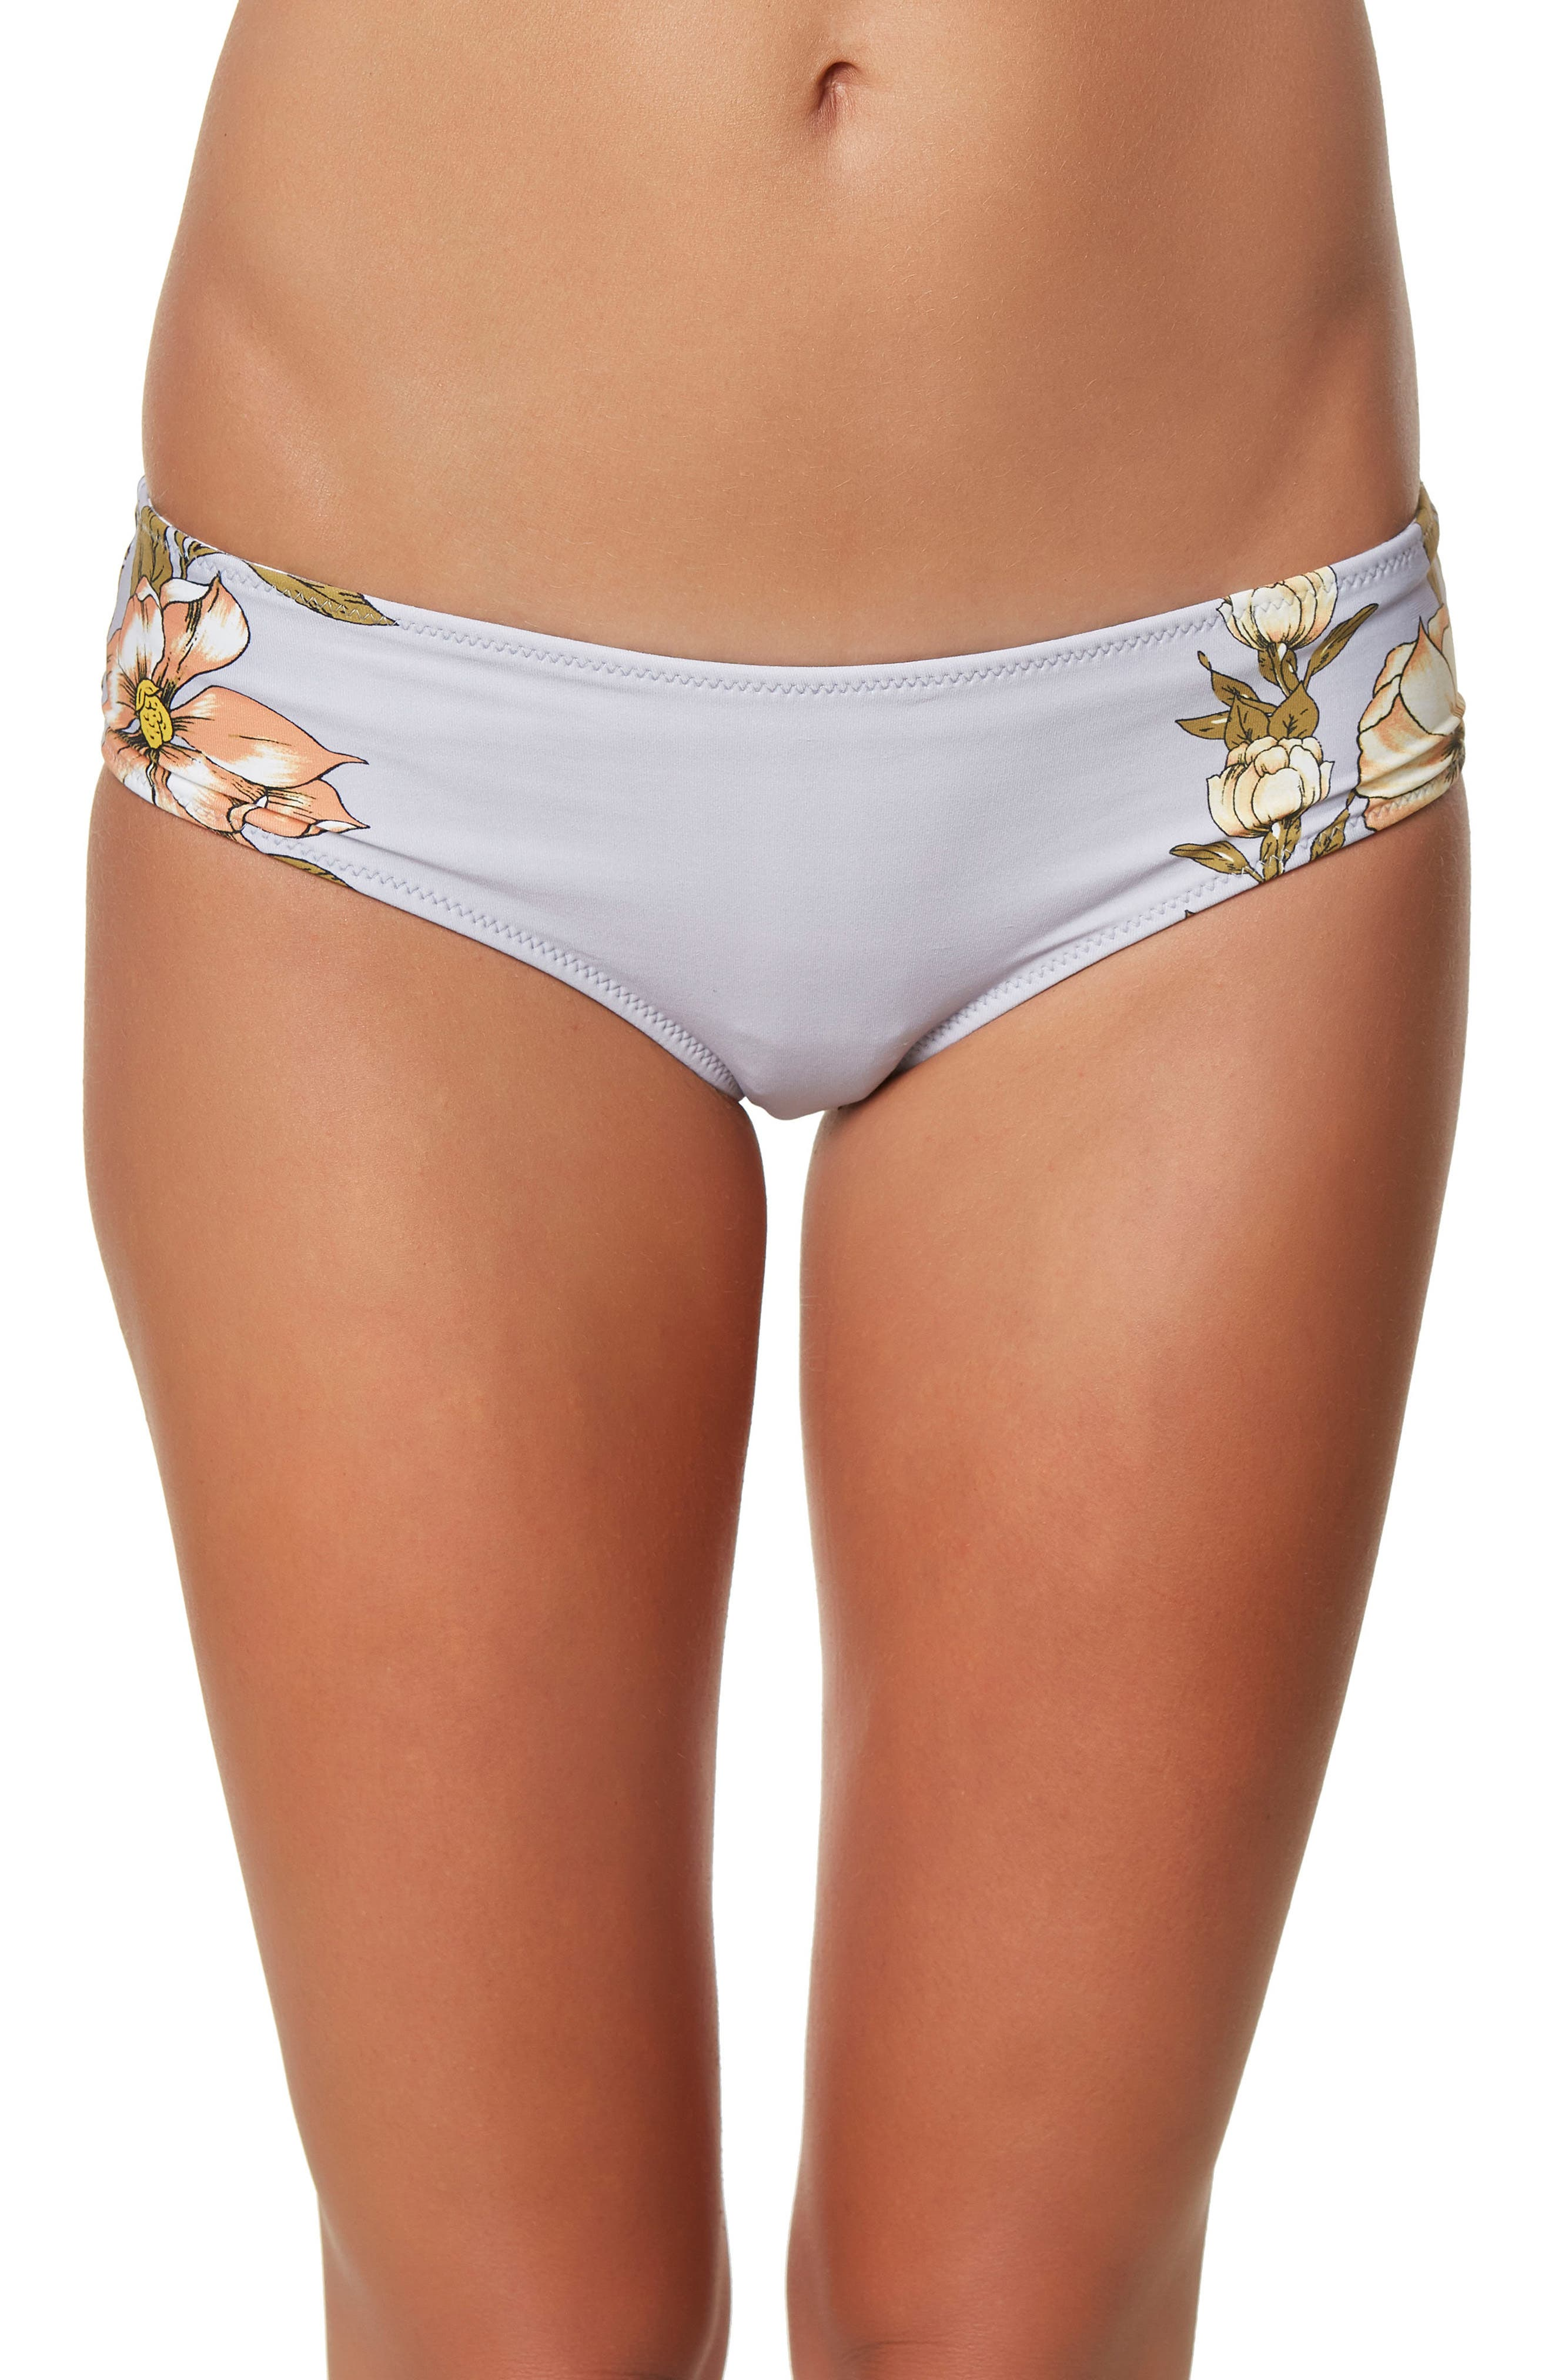 Main Image - O'Neill Aloha Floral Revo Hipster Bikini Bottoms